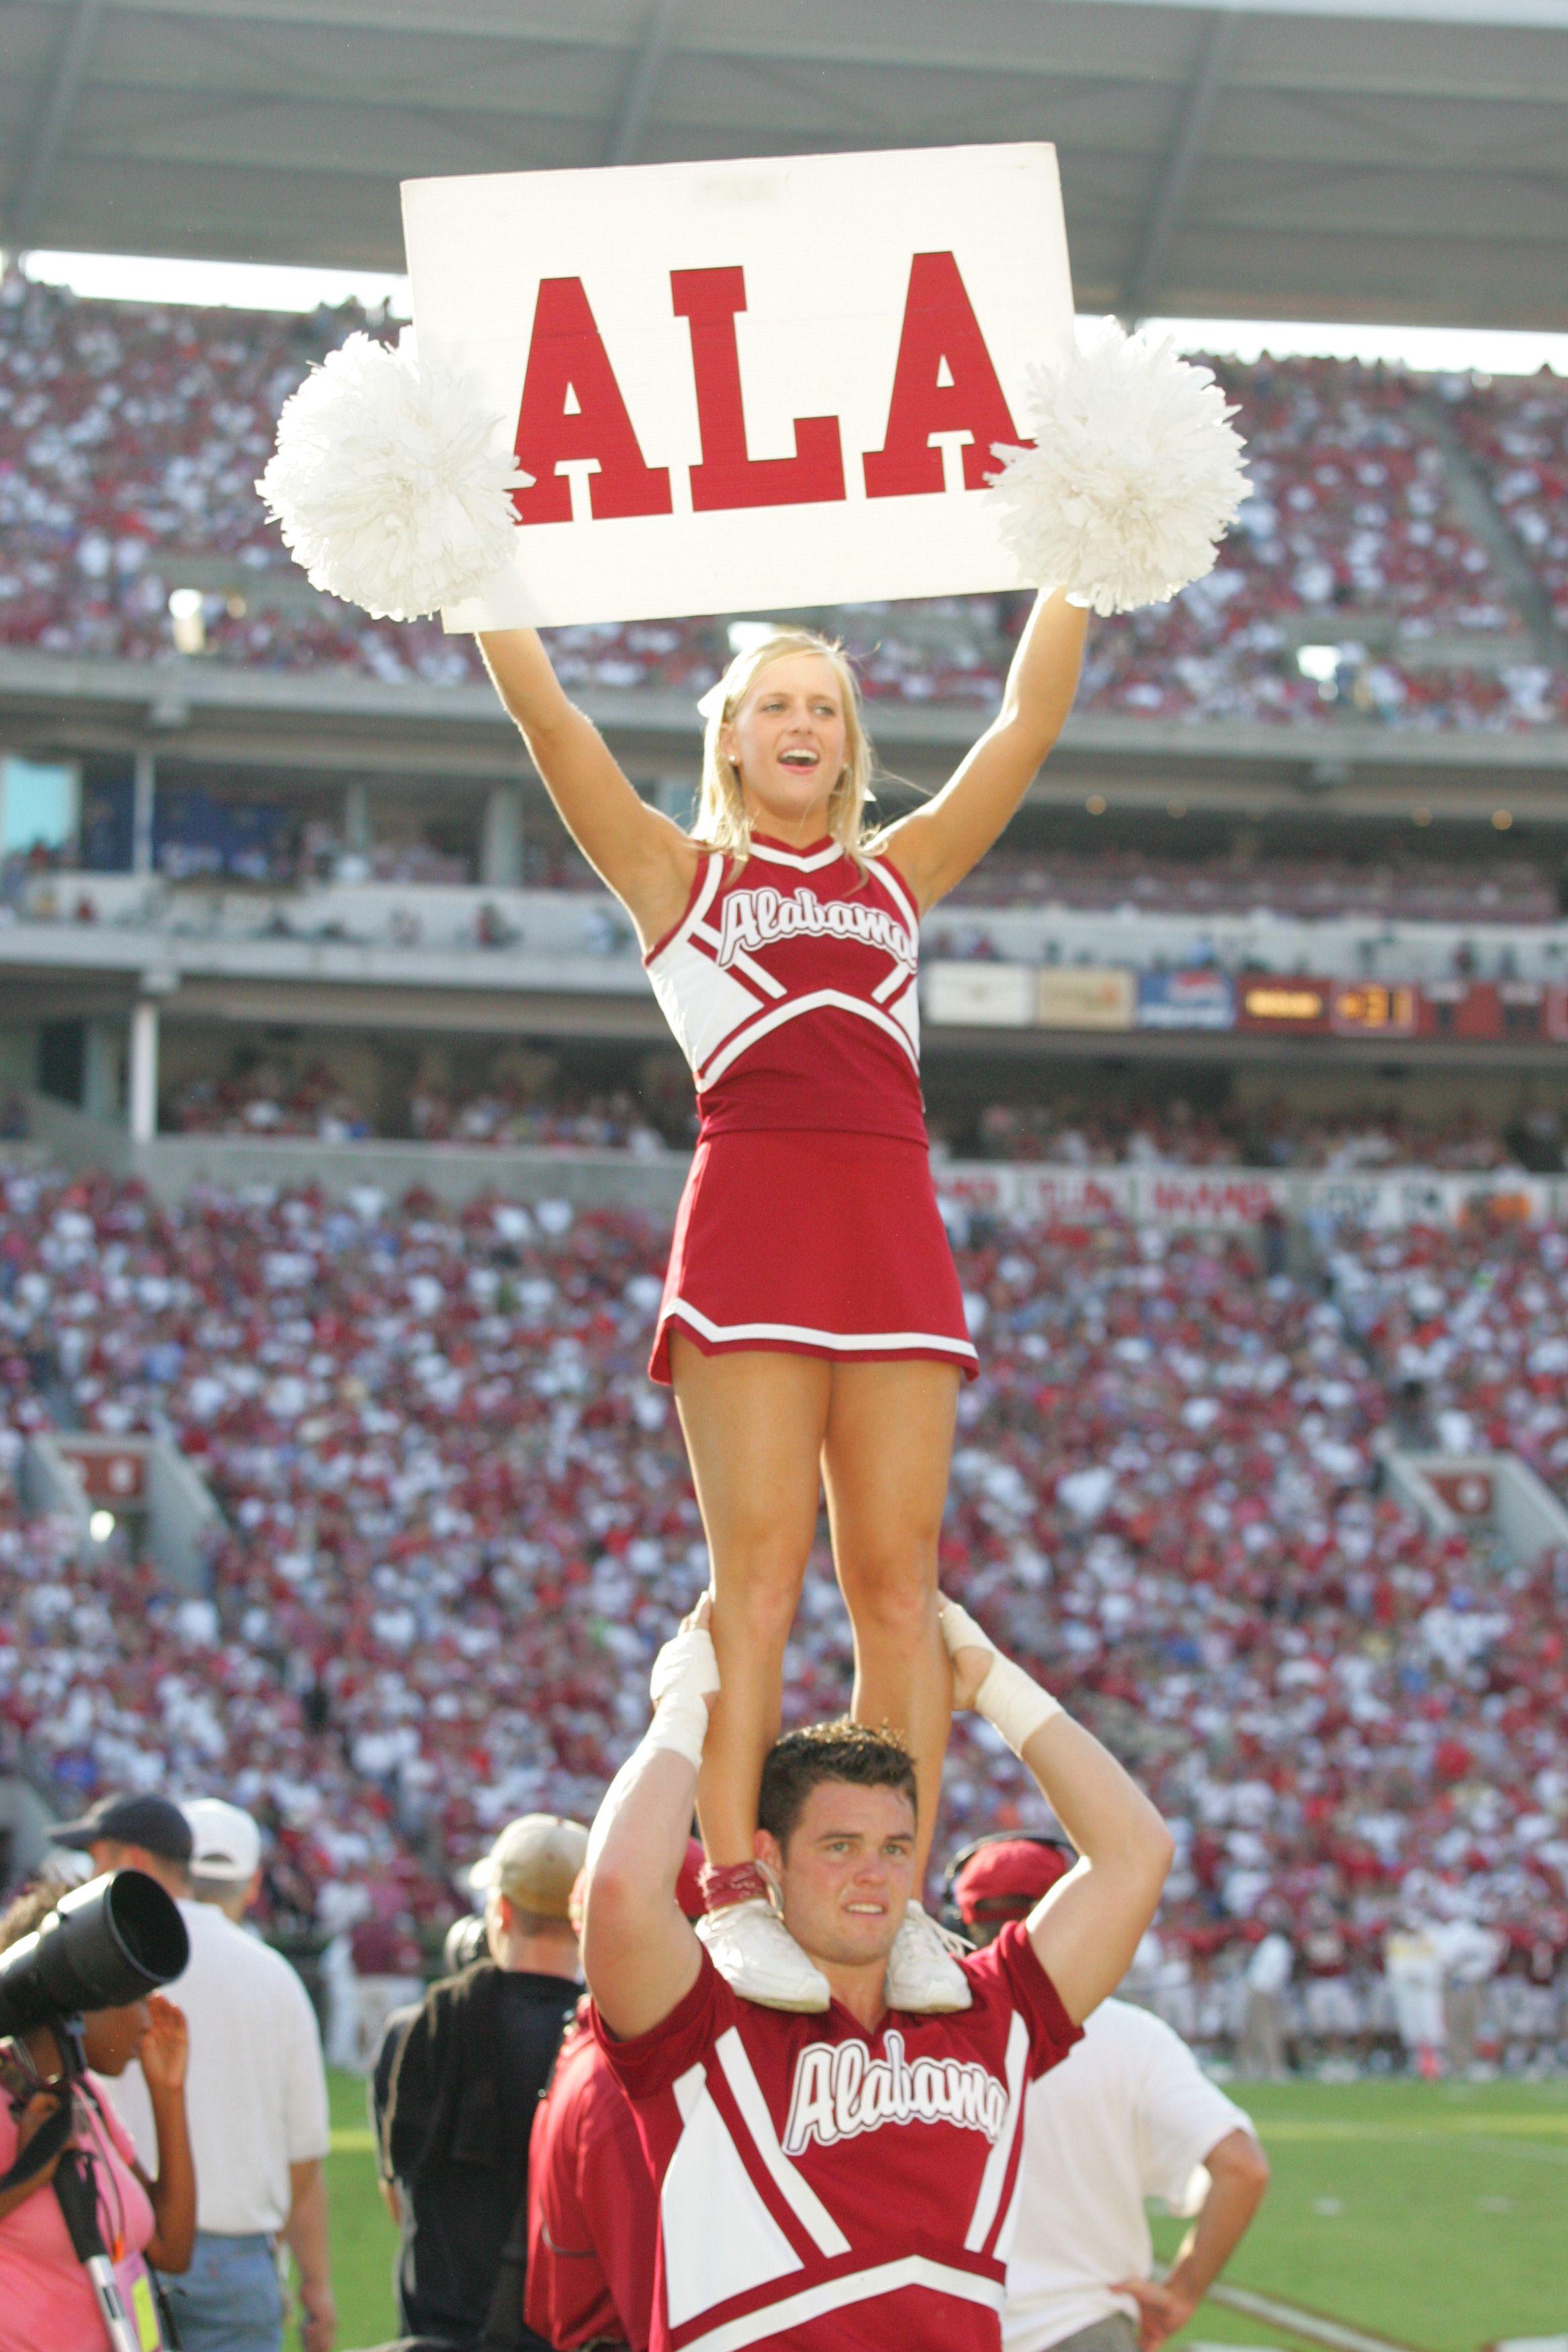 Bama Florida 10105 4 236 Cheerleading, Alabama